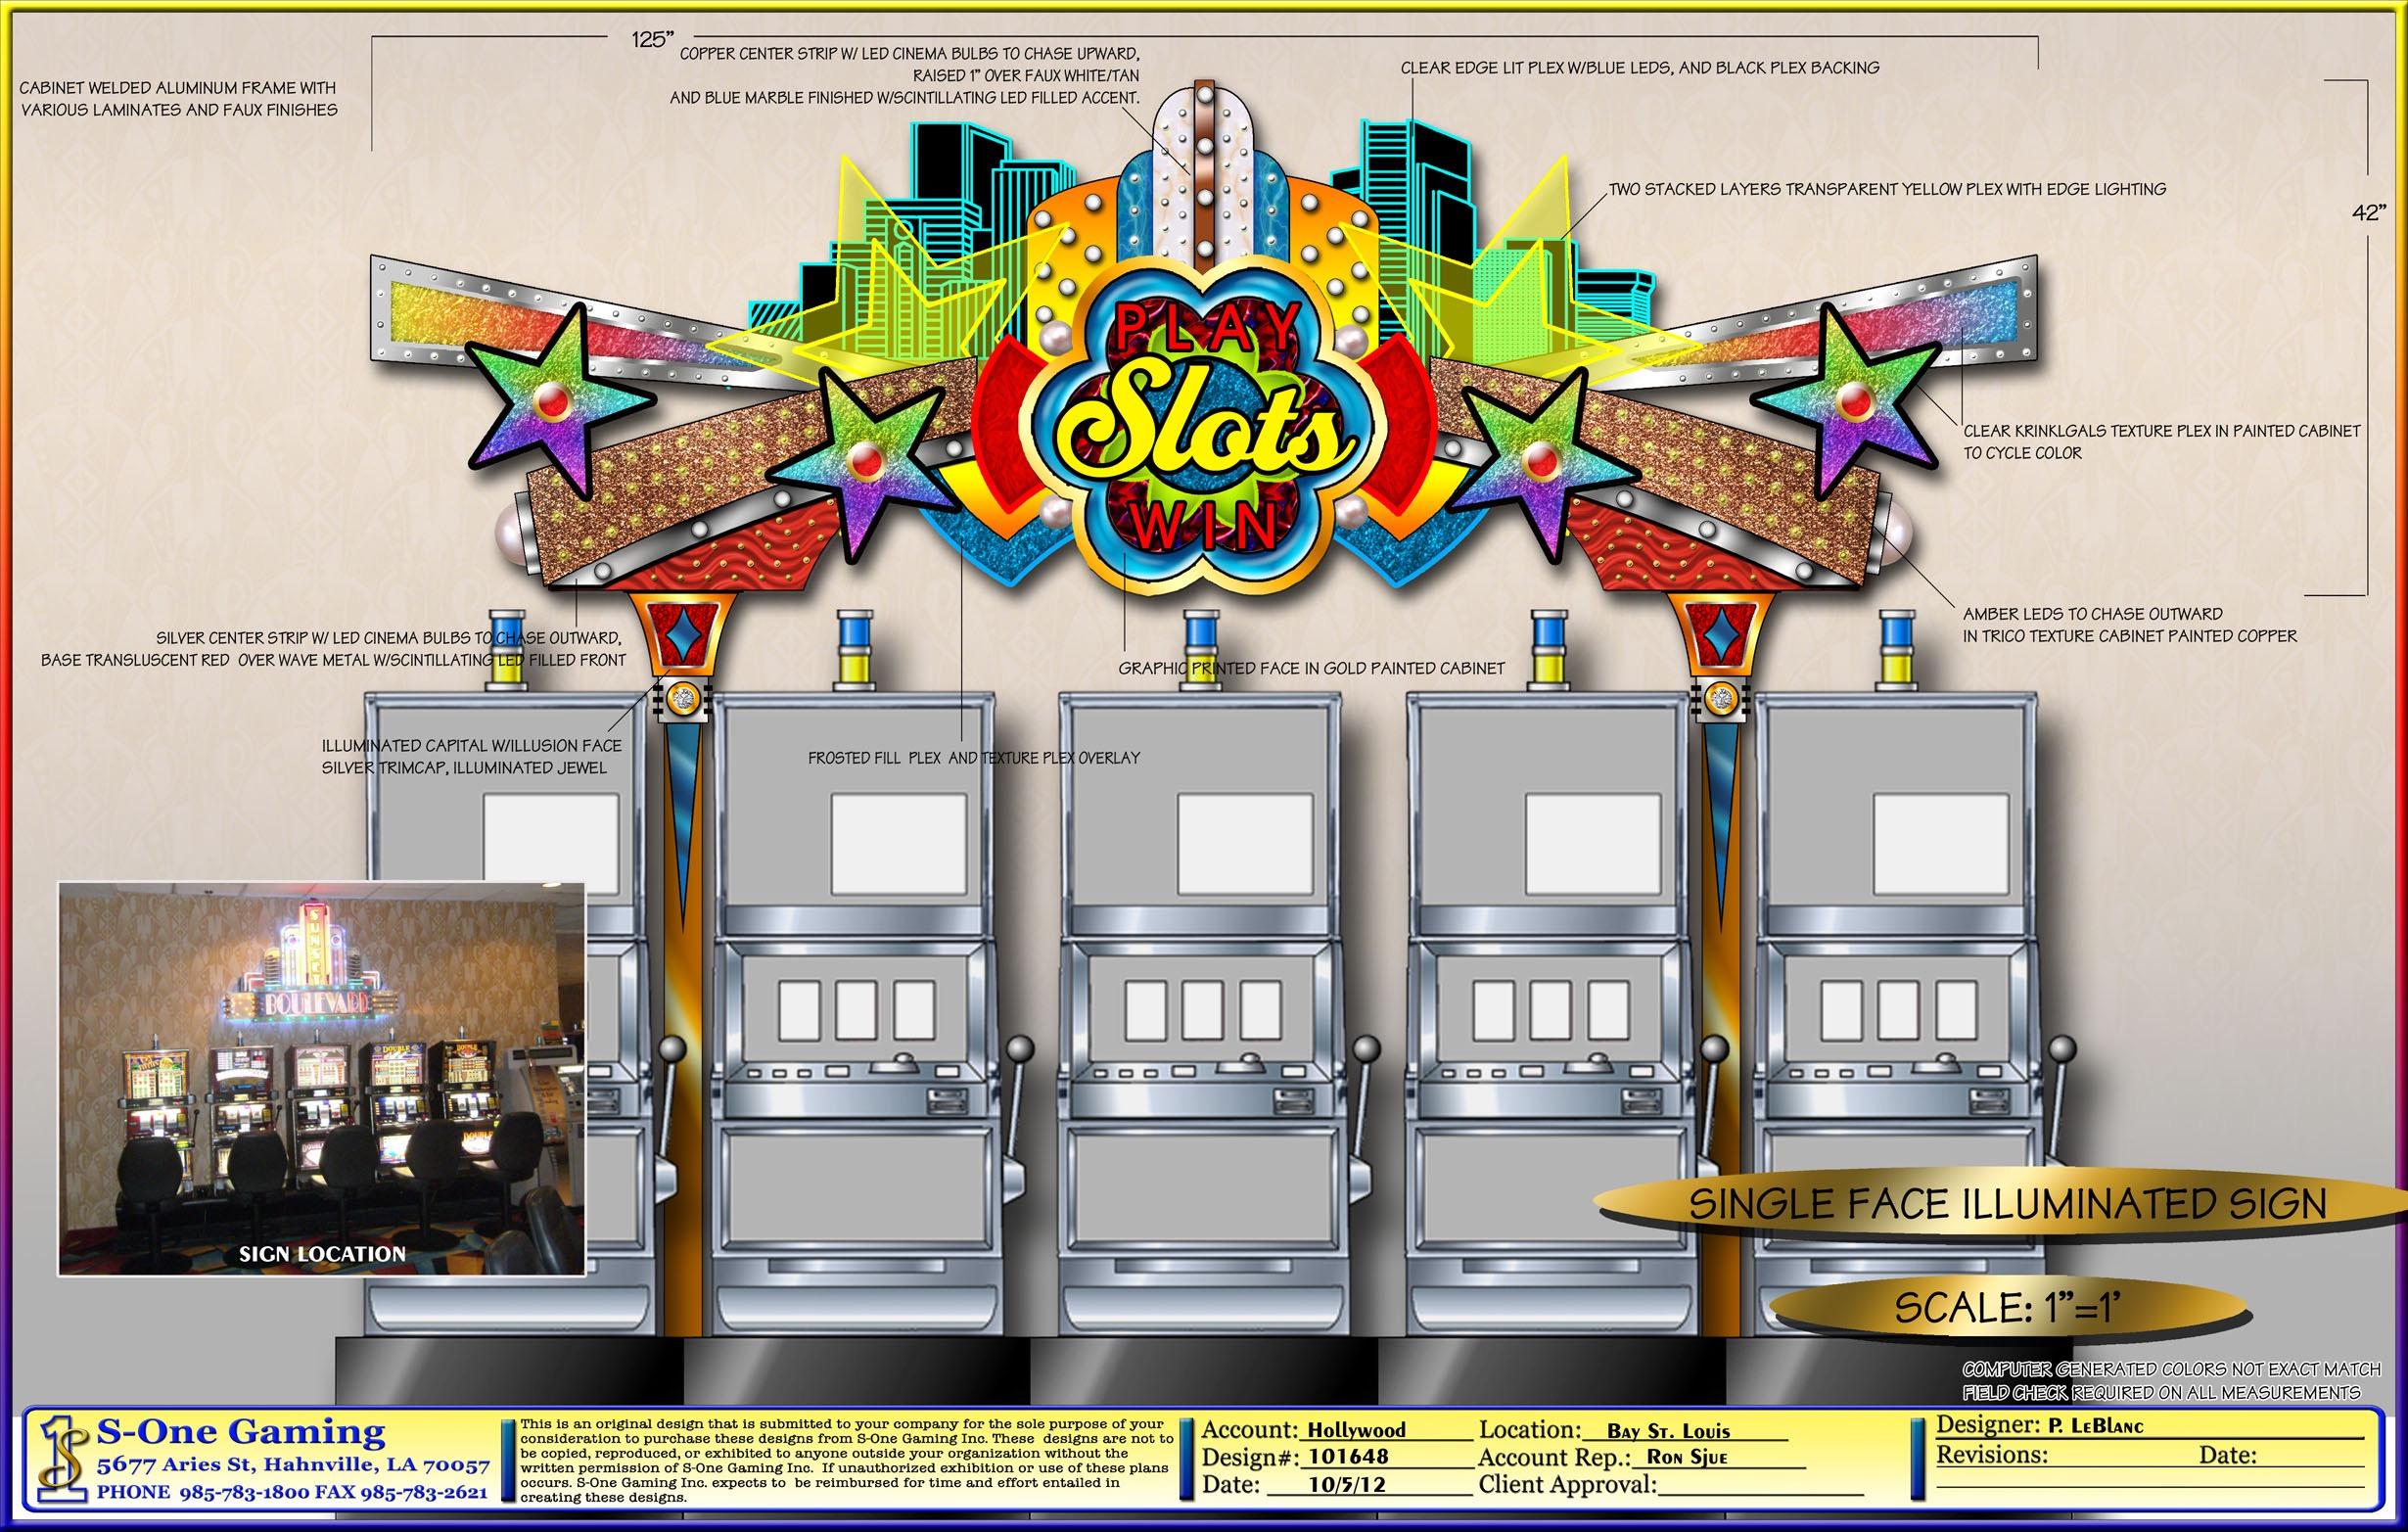 101648 Hollywood BSL 5game SF sign.jpg